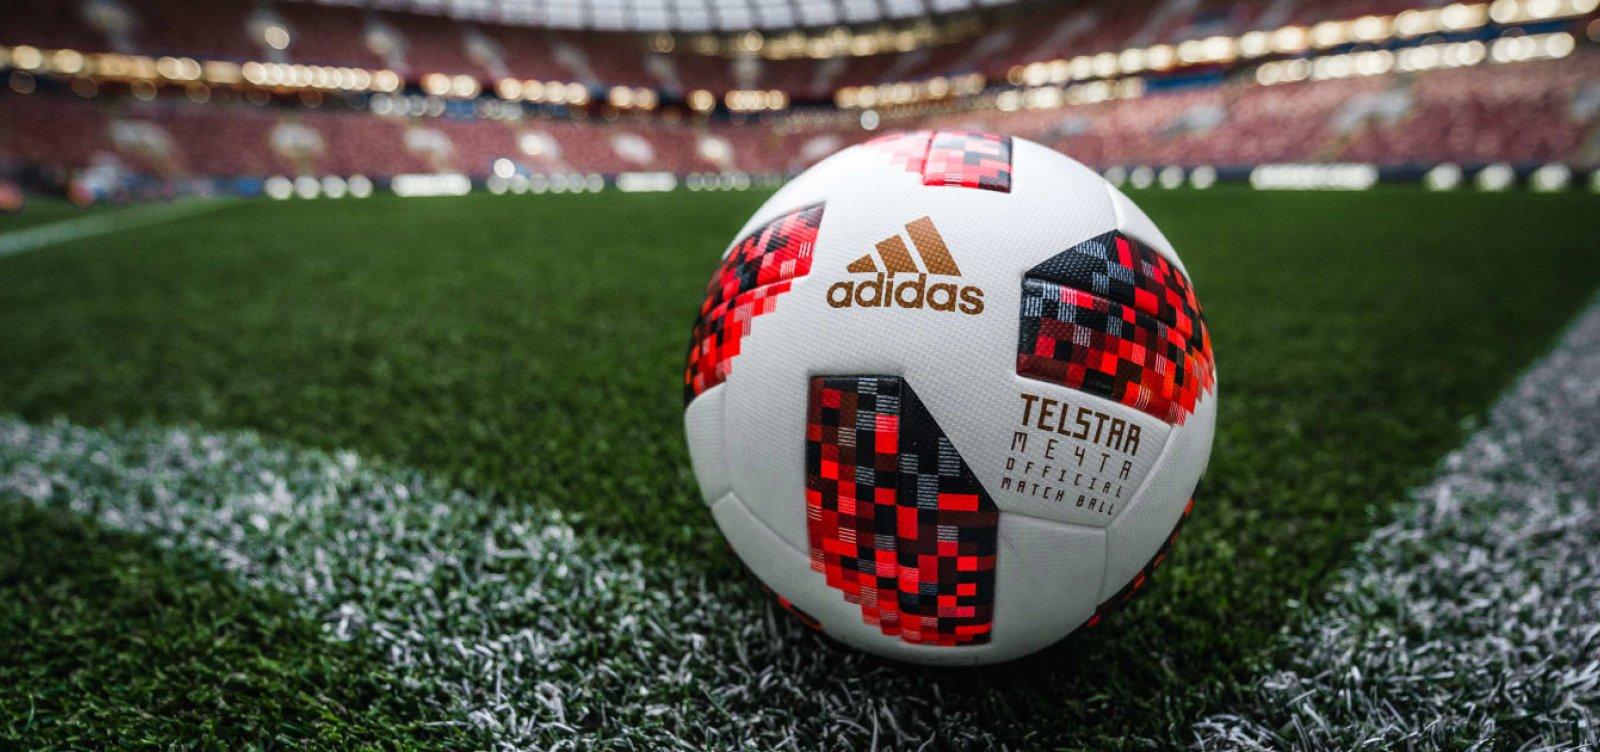 Copa da Rússia terá bola colorida a partir das oitavas de final ... 0a831d695c947